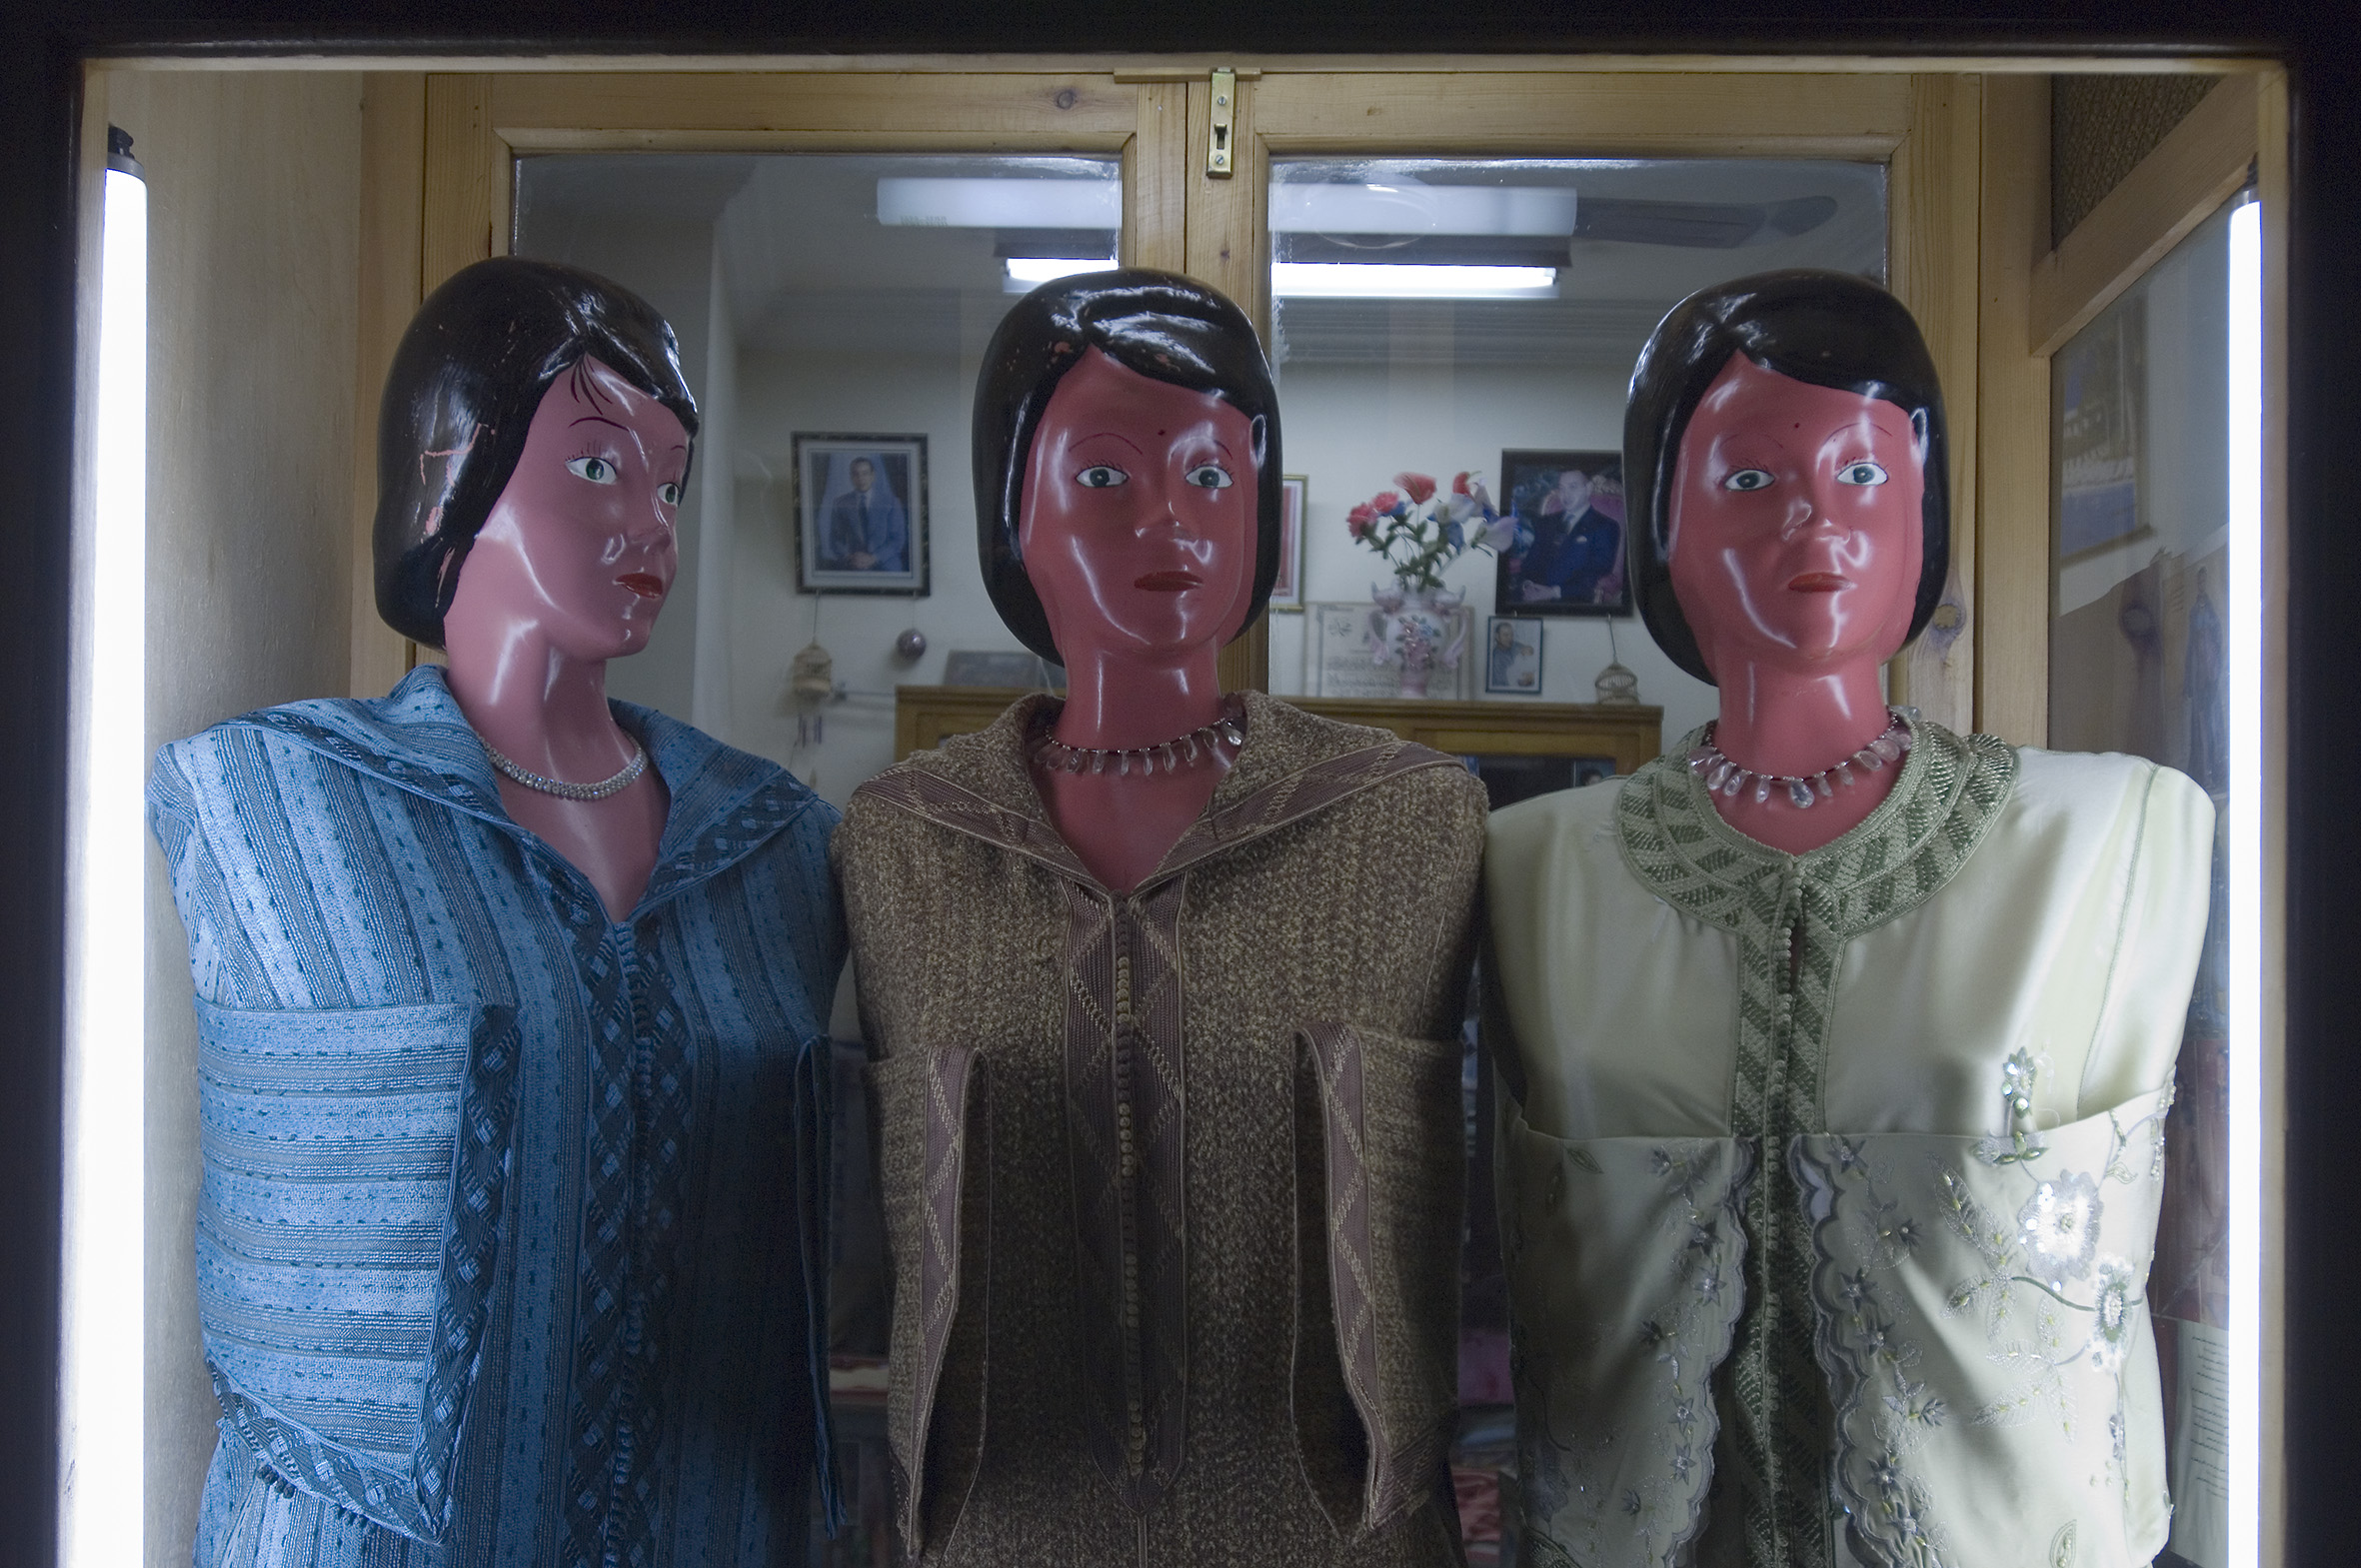 pink dummies